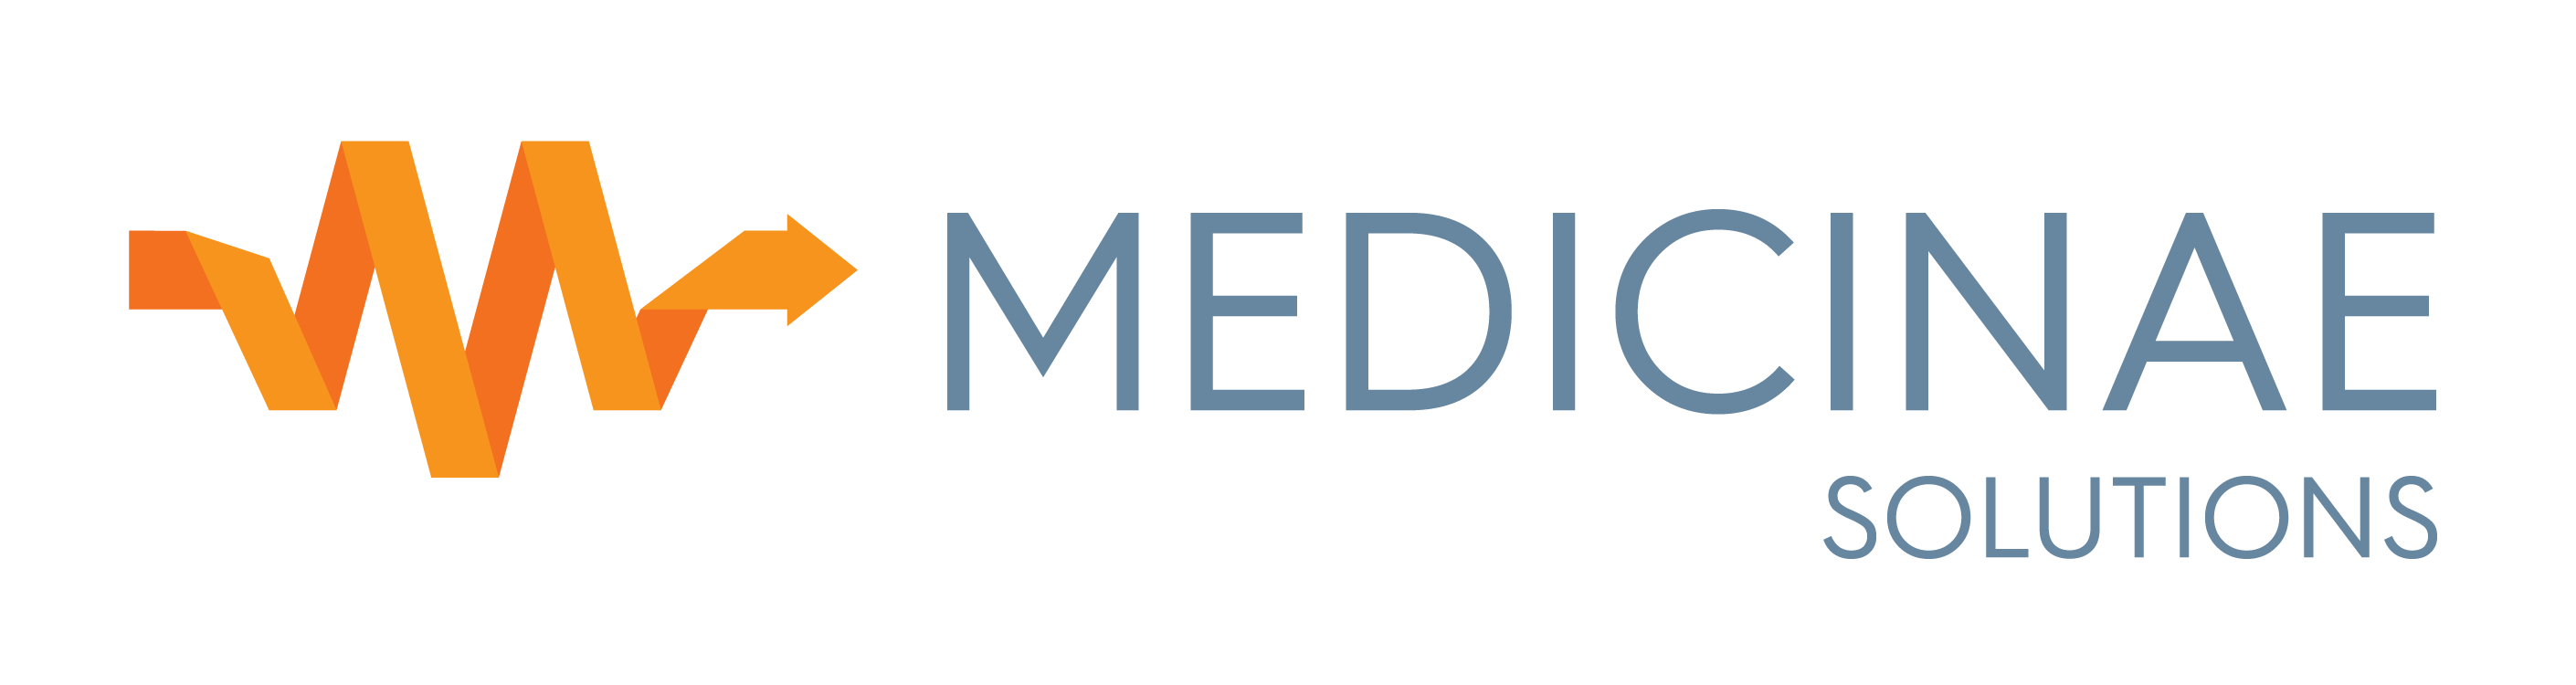 Medicinae